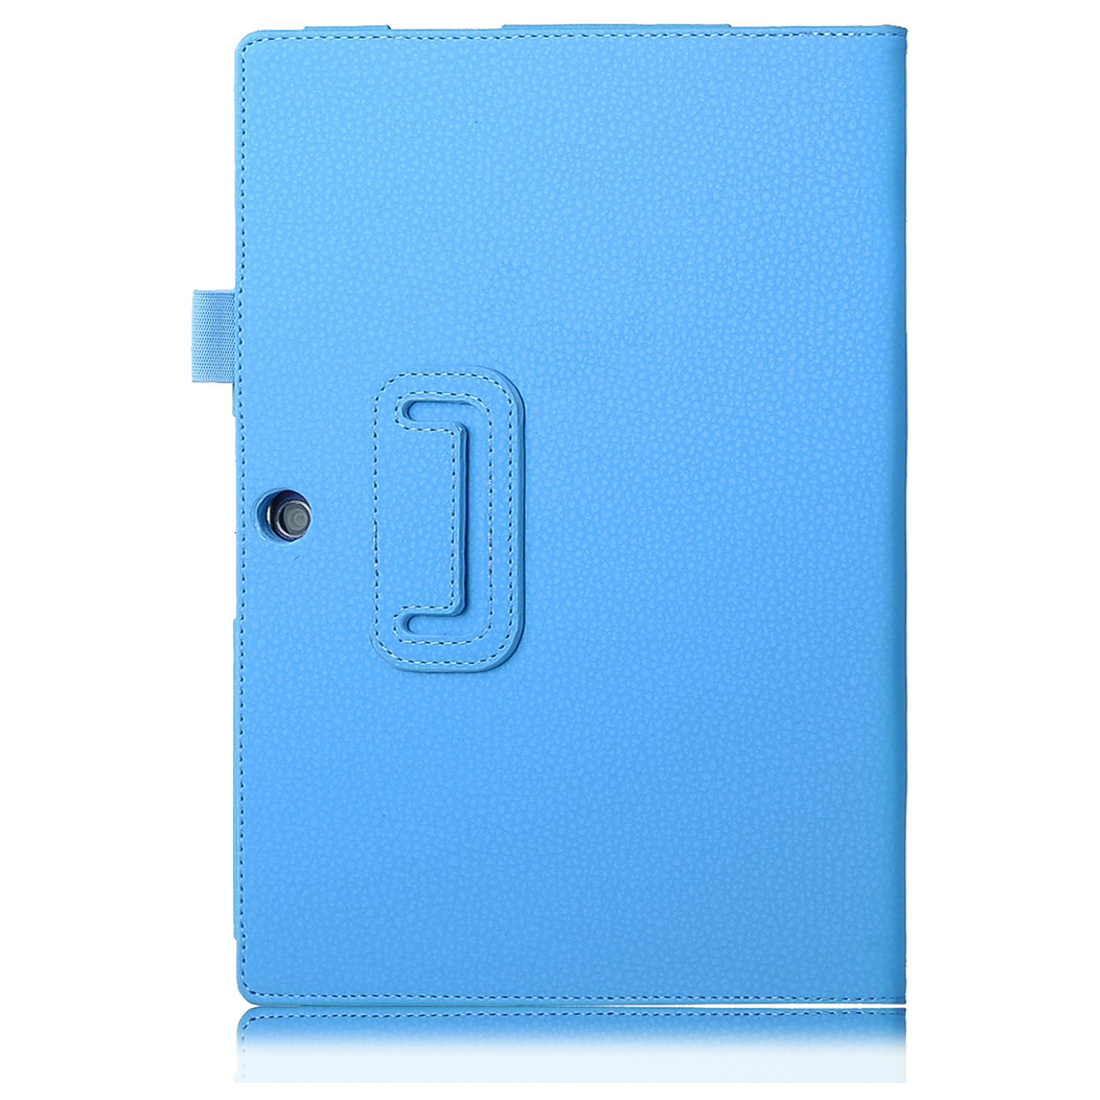 Для acer Iconia One 10 B3-A20 чехол Slim-Книга Стенд чехол для acer Iconia One 10 B3-A20 10,1 -планшет (синий)